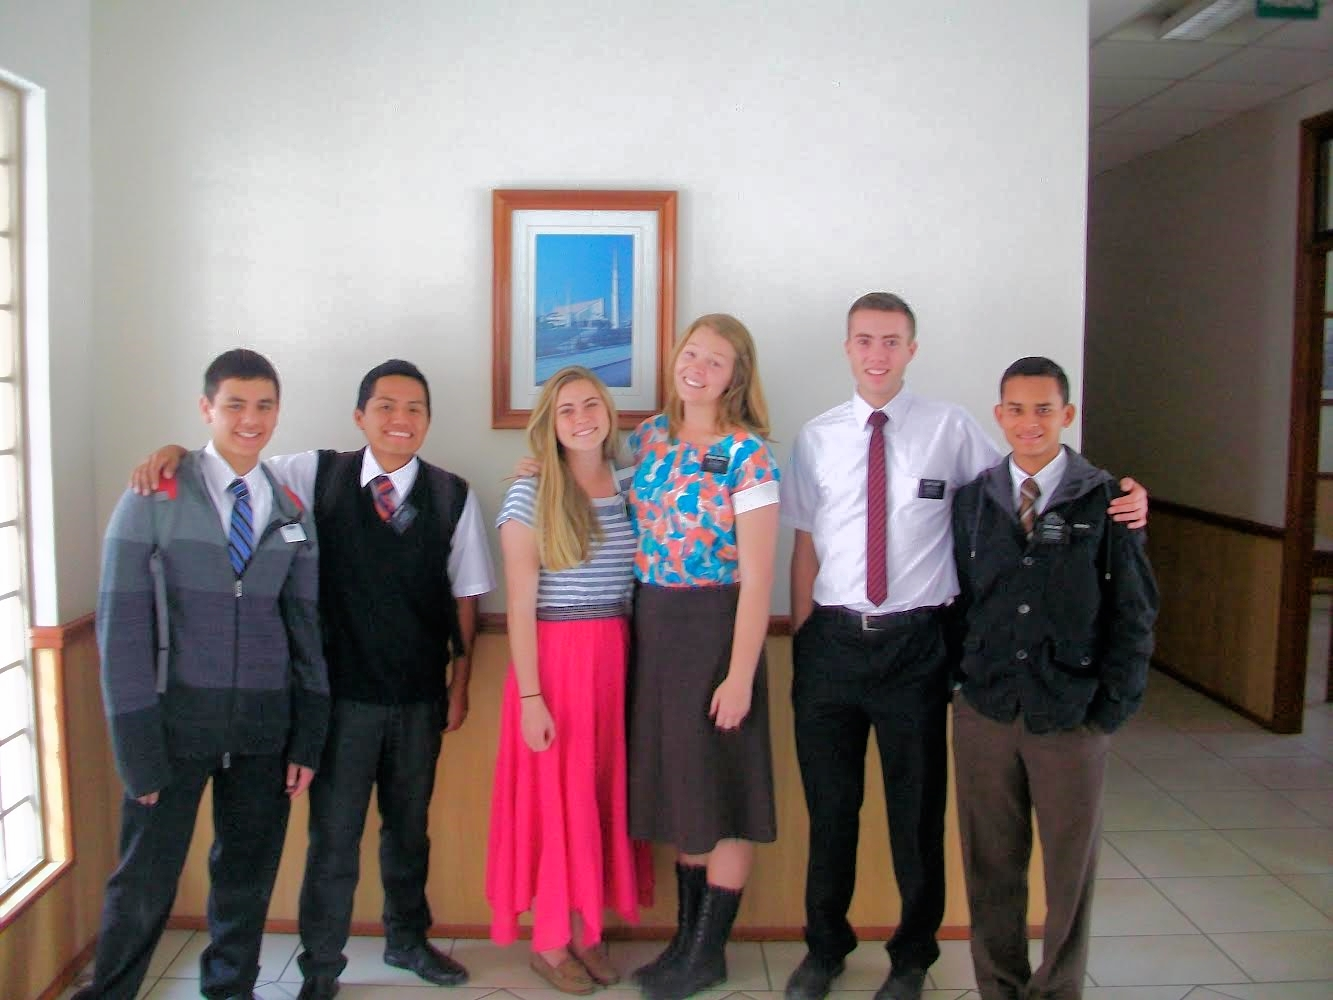 goodbye to the atahualpa district!